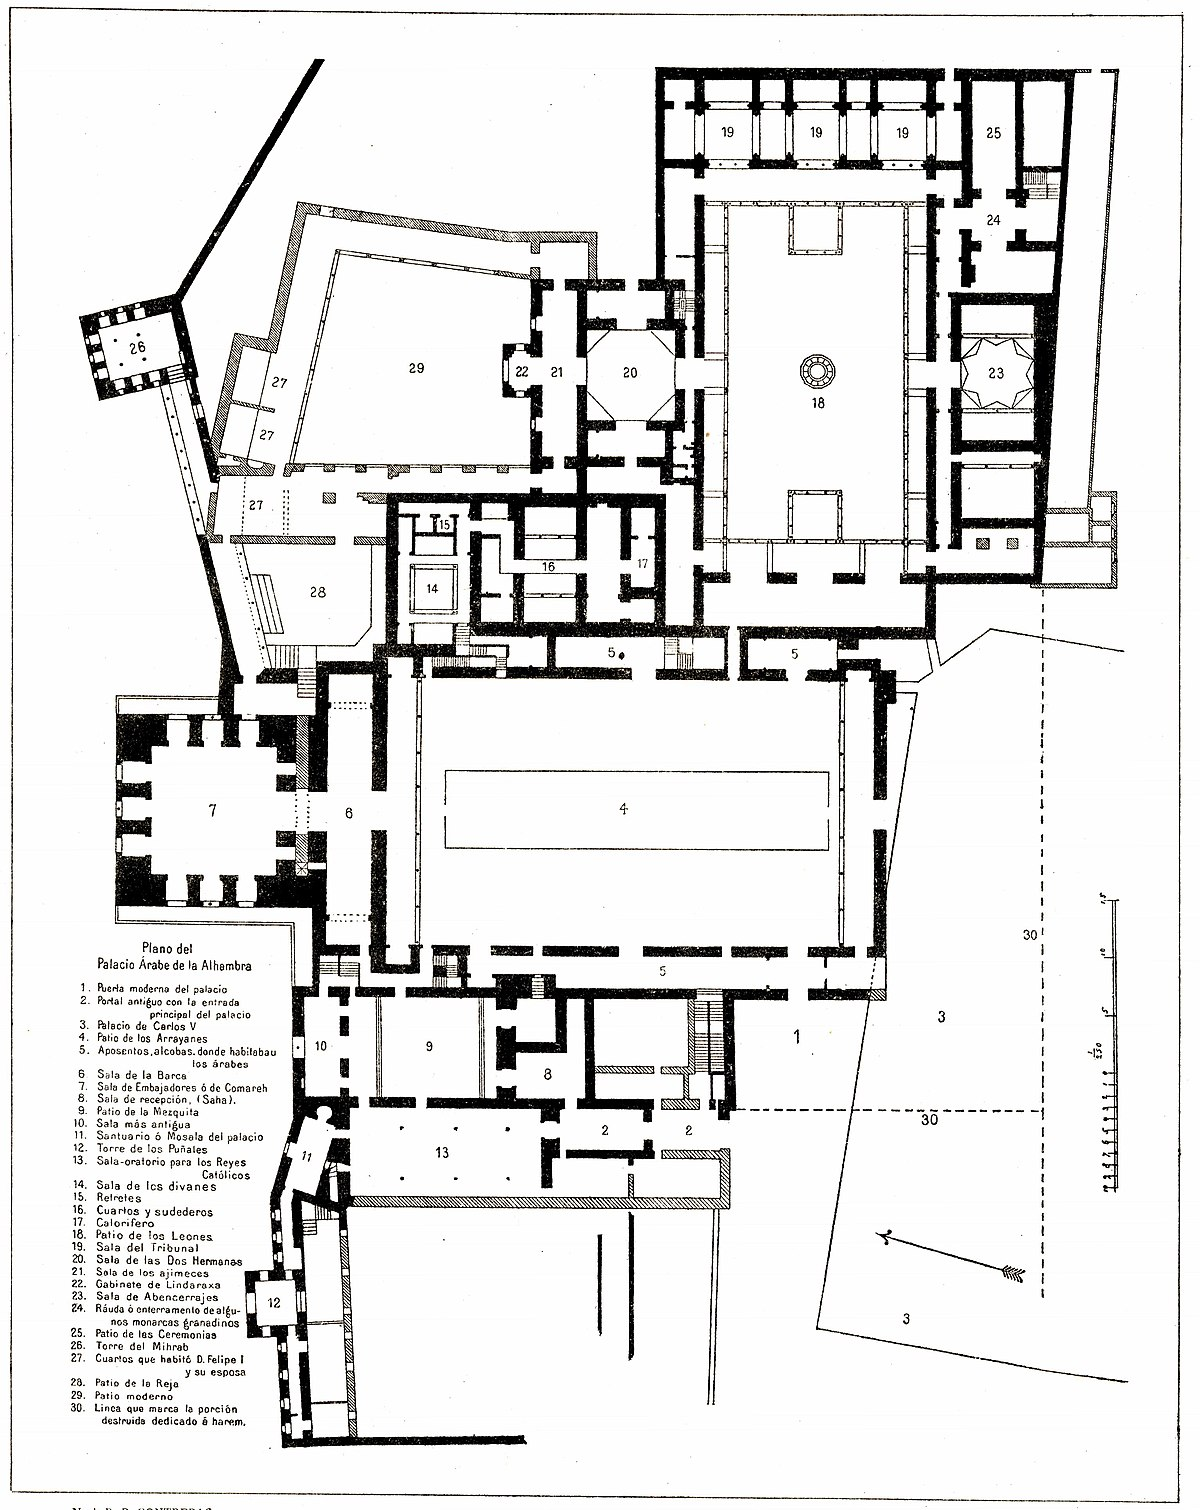 116 Tafel 6 Grenada Alhambra - Plano del Palacio Arabe.jpg